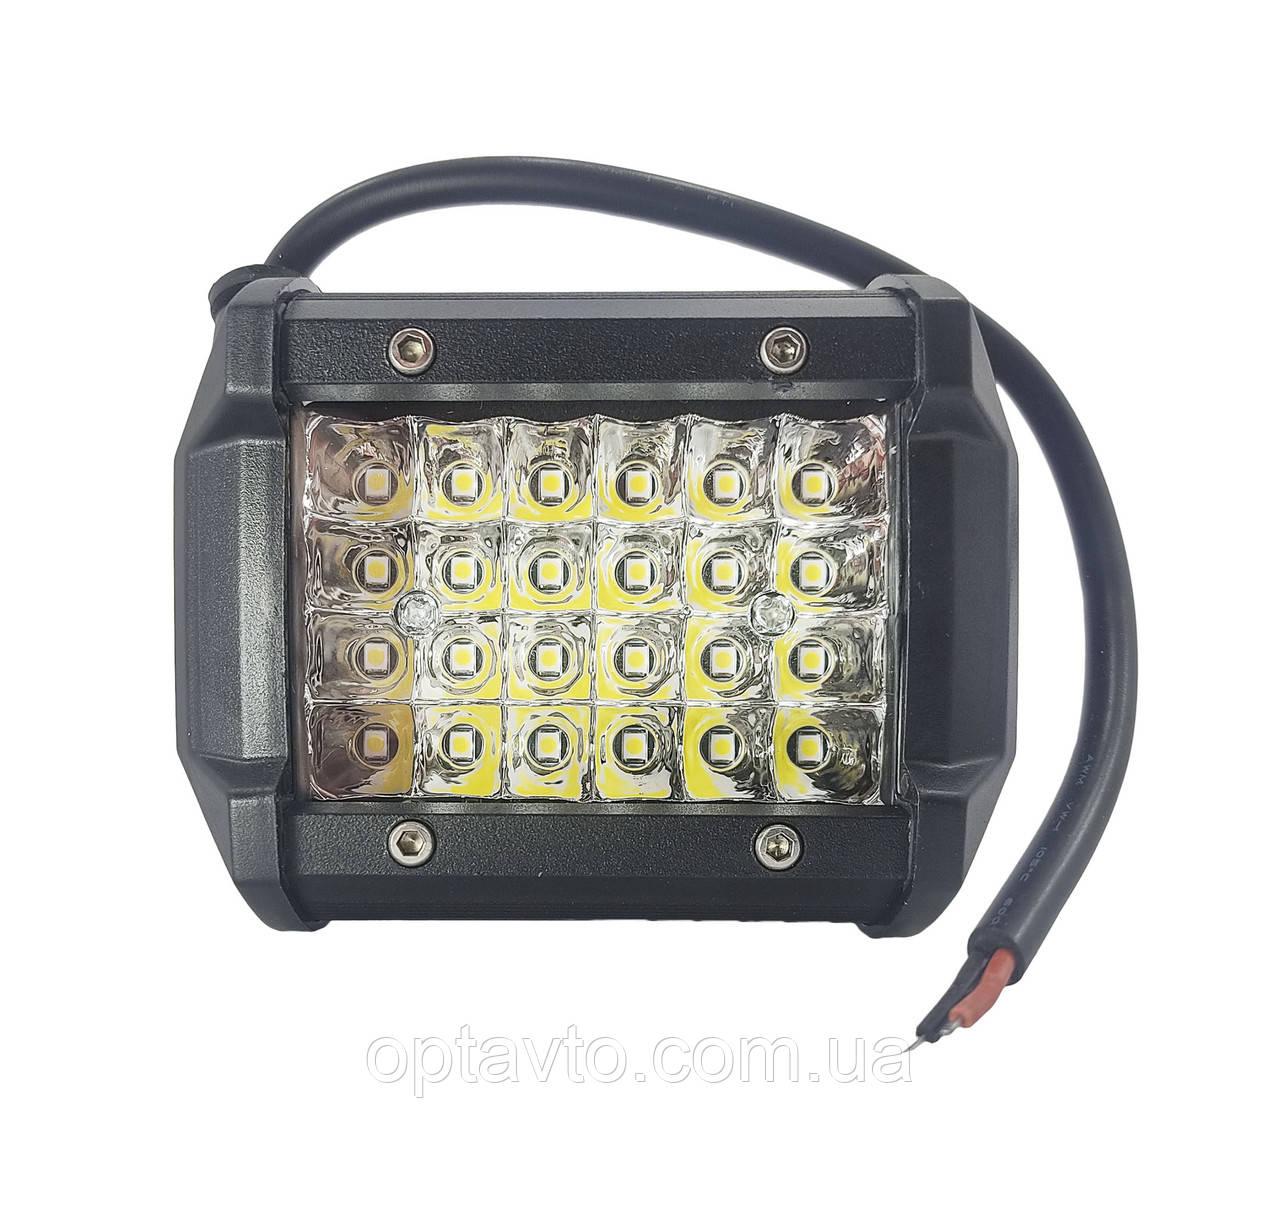 Четырехрядная мощная LED (лэд) фара - прожектор на 24 диода. H - 72W / S. Пр-во Корея